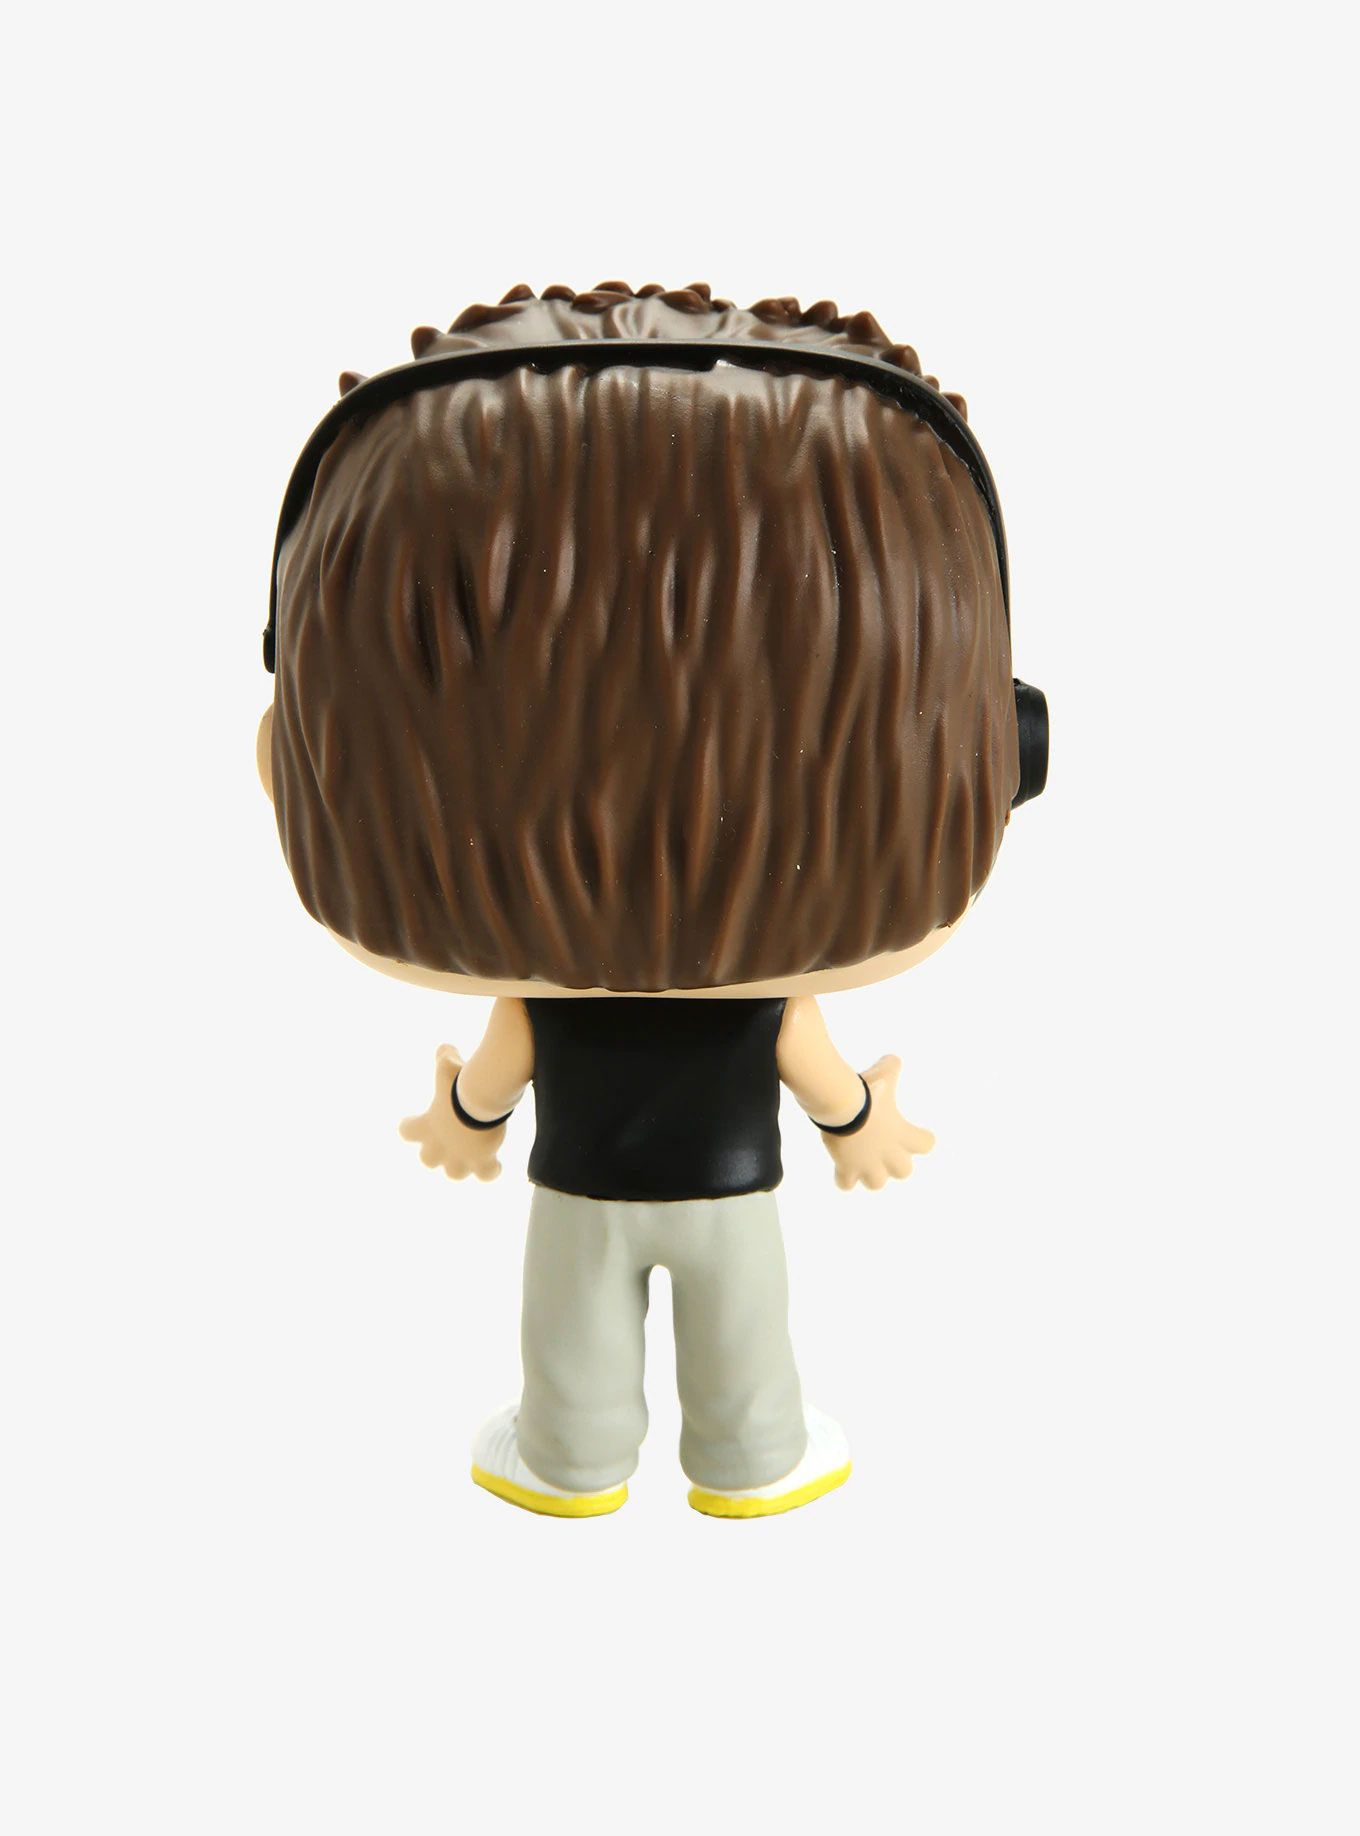 JC Chasez #112 - NSYNC - Funko Pop! Rocks